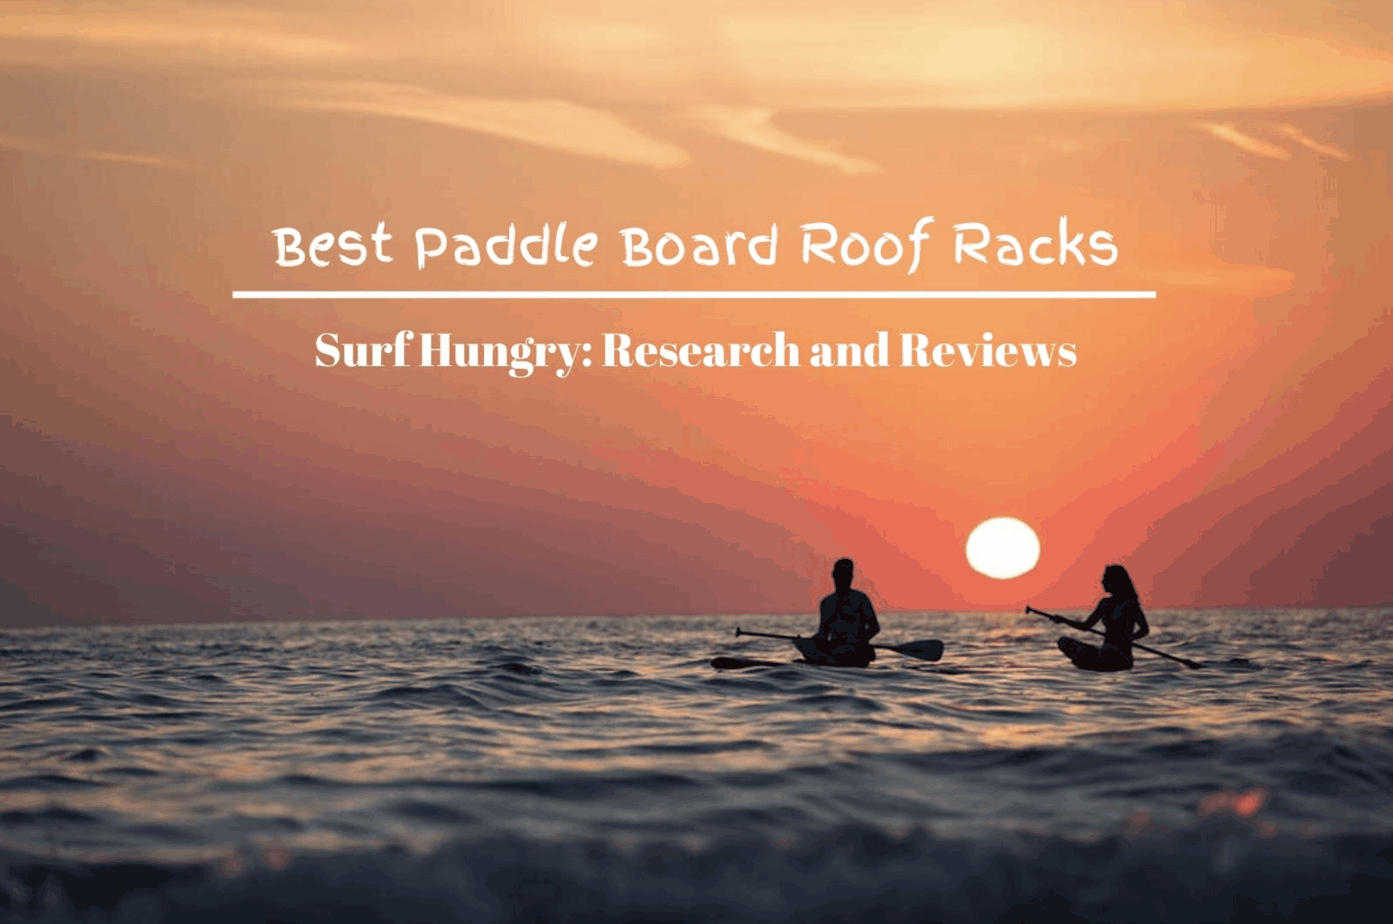 best paddle board roof racks